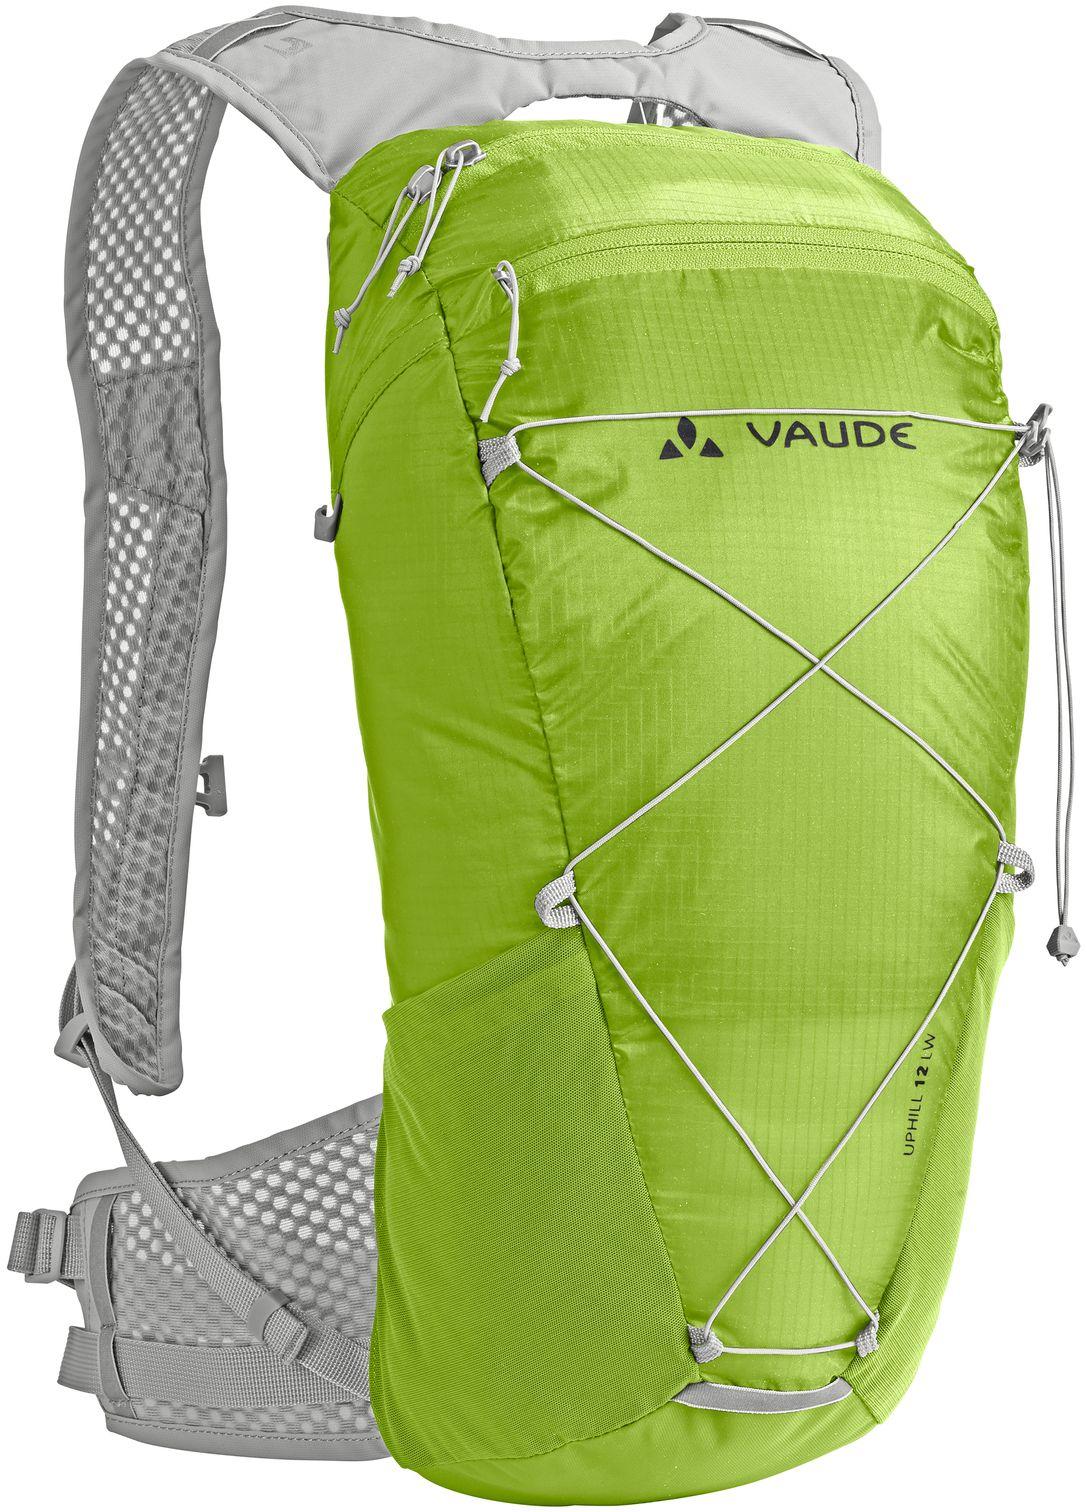 Vaude Uphill 16 LW - pear uni